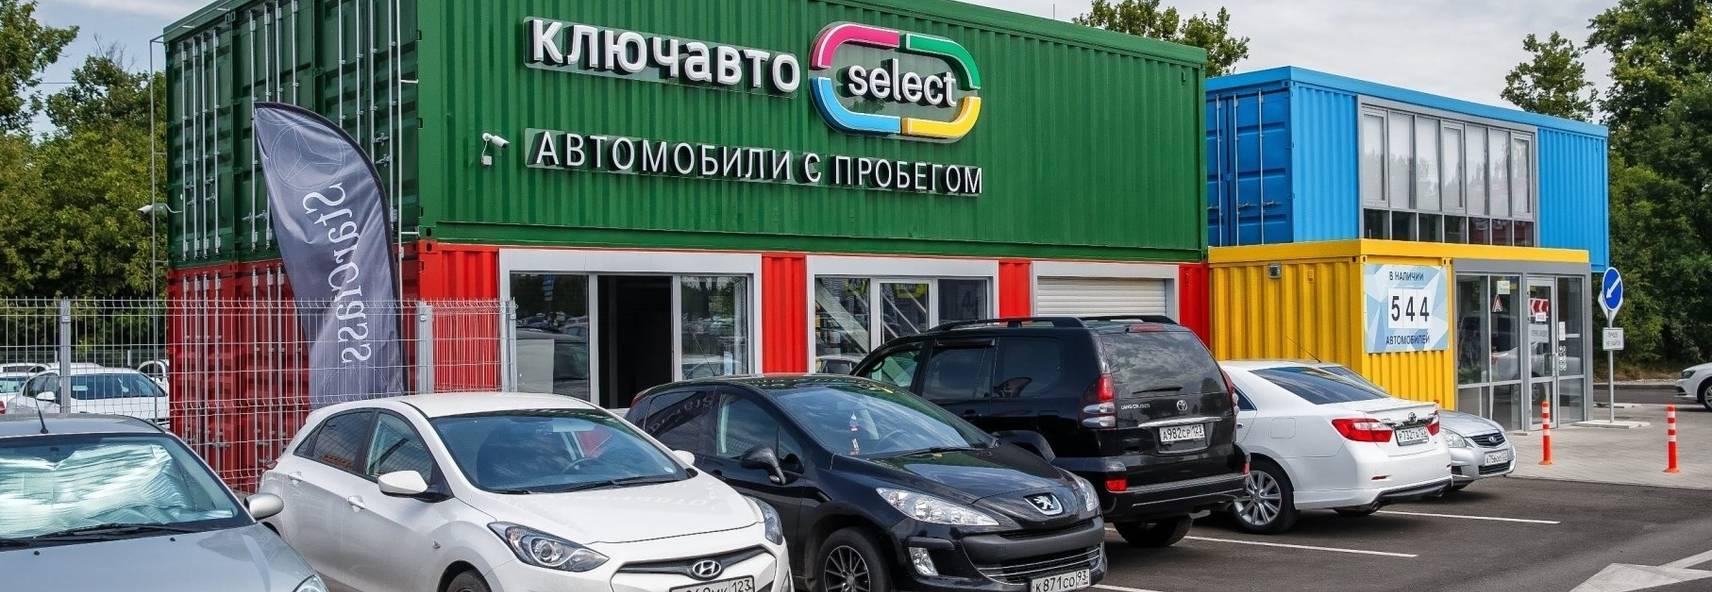 КЛЮЧАВТО-Select Краснодар Аэропорт